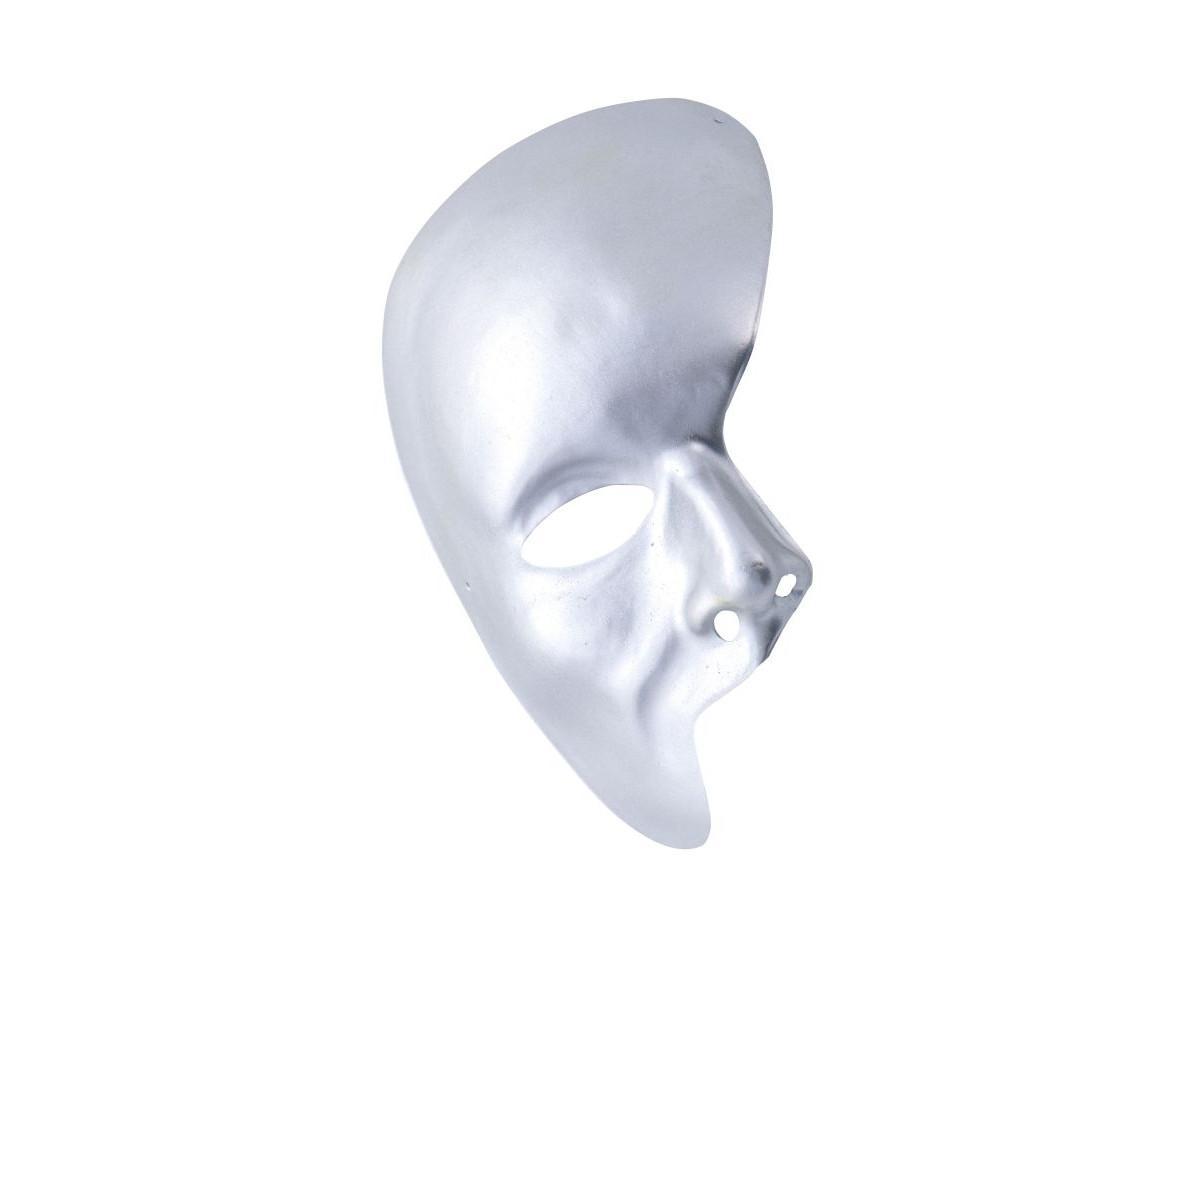 Ansiktsmask - Half face Silver Phantom of the opera mask